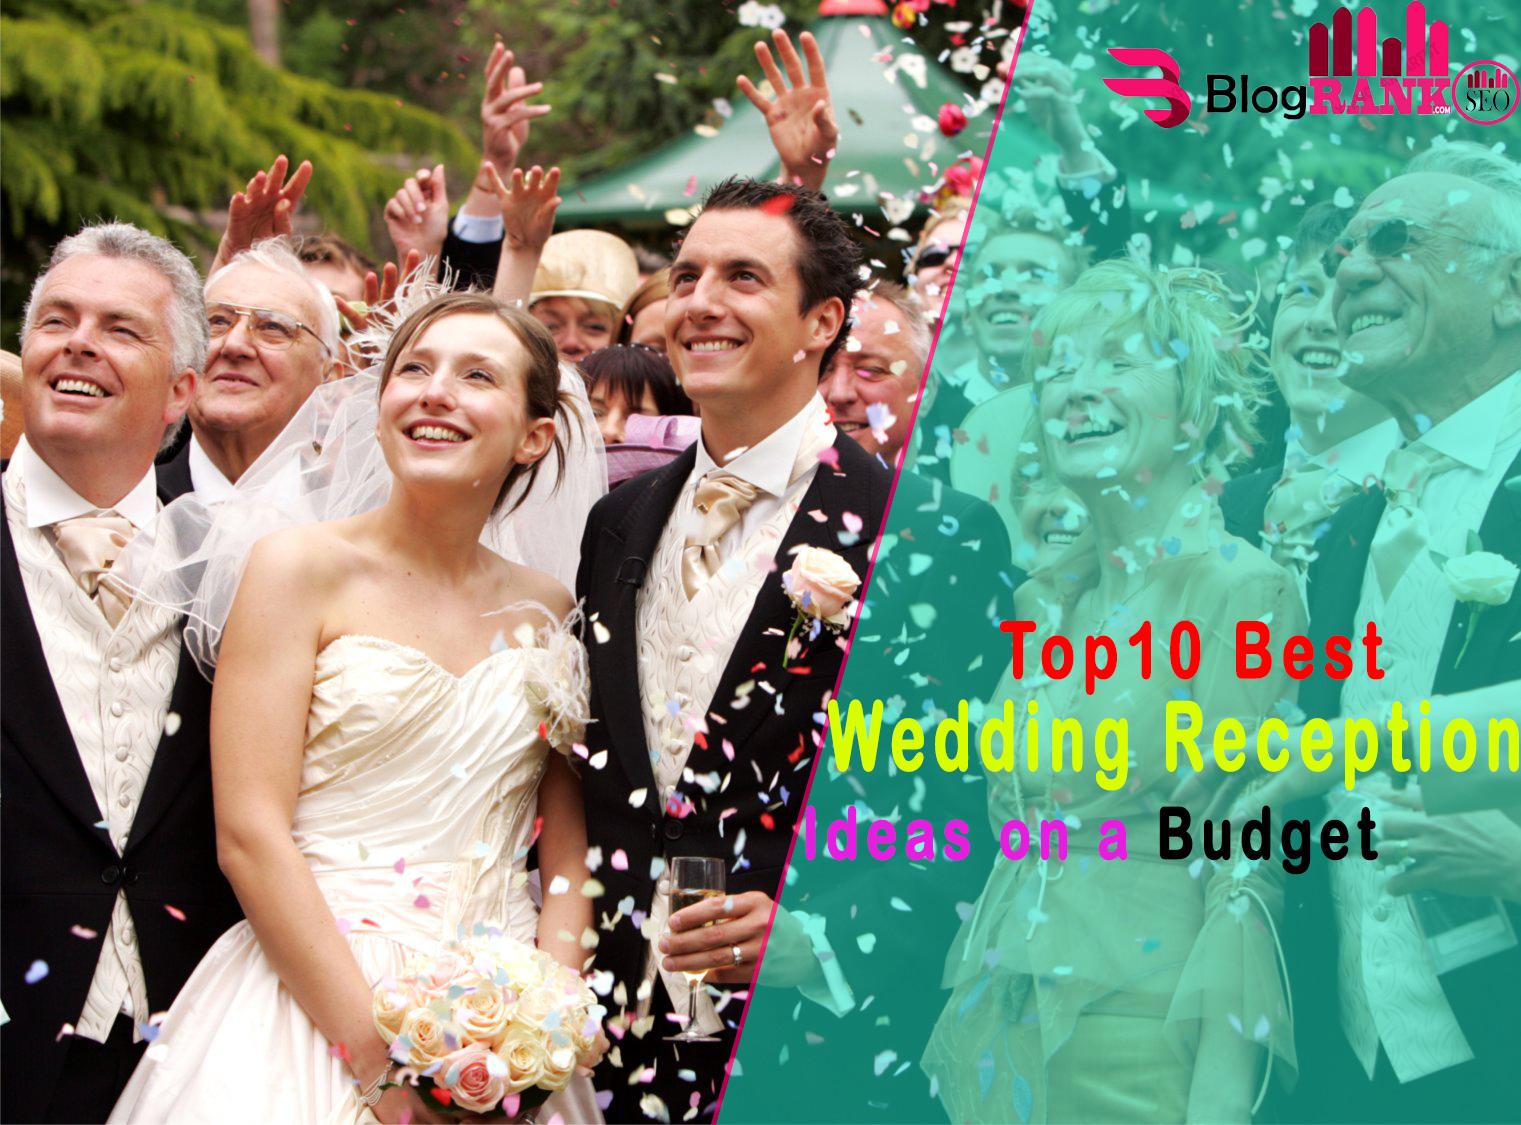 Top 10 Best Wedding Reception Ideas on a Budget